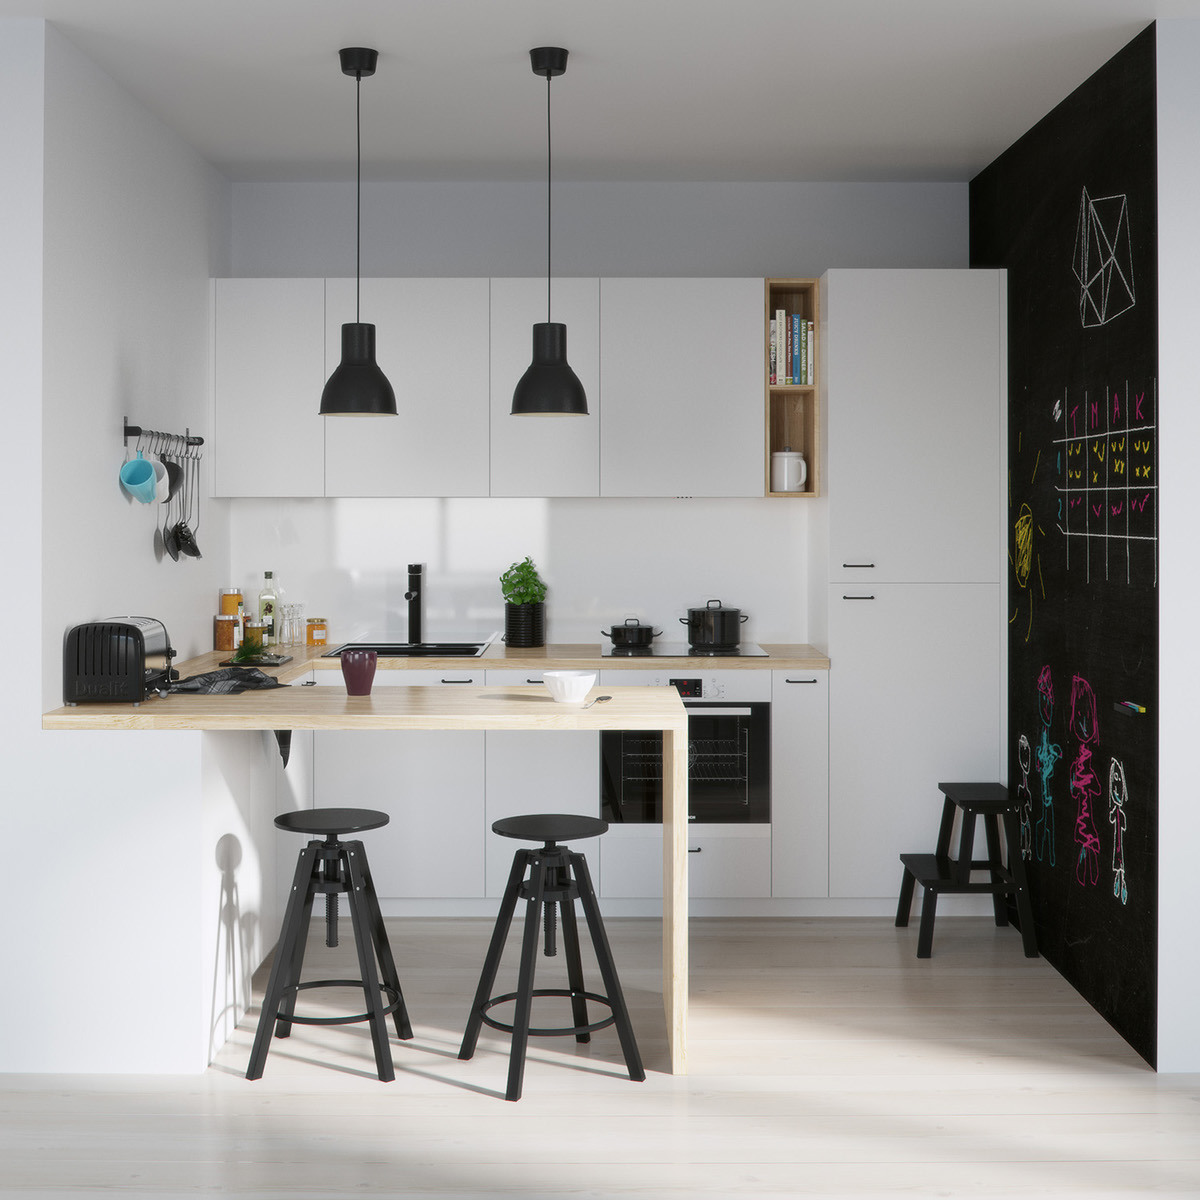 simple-Scandinavian-kitchen-black-dome-lighting